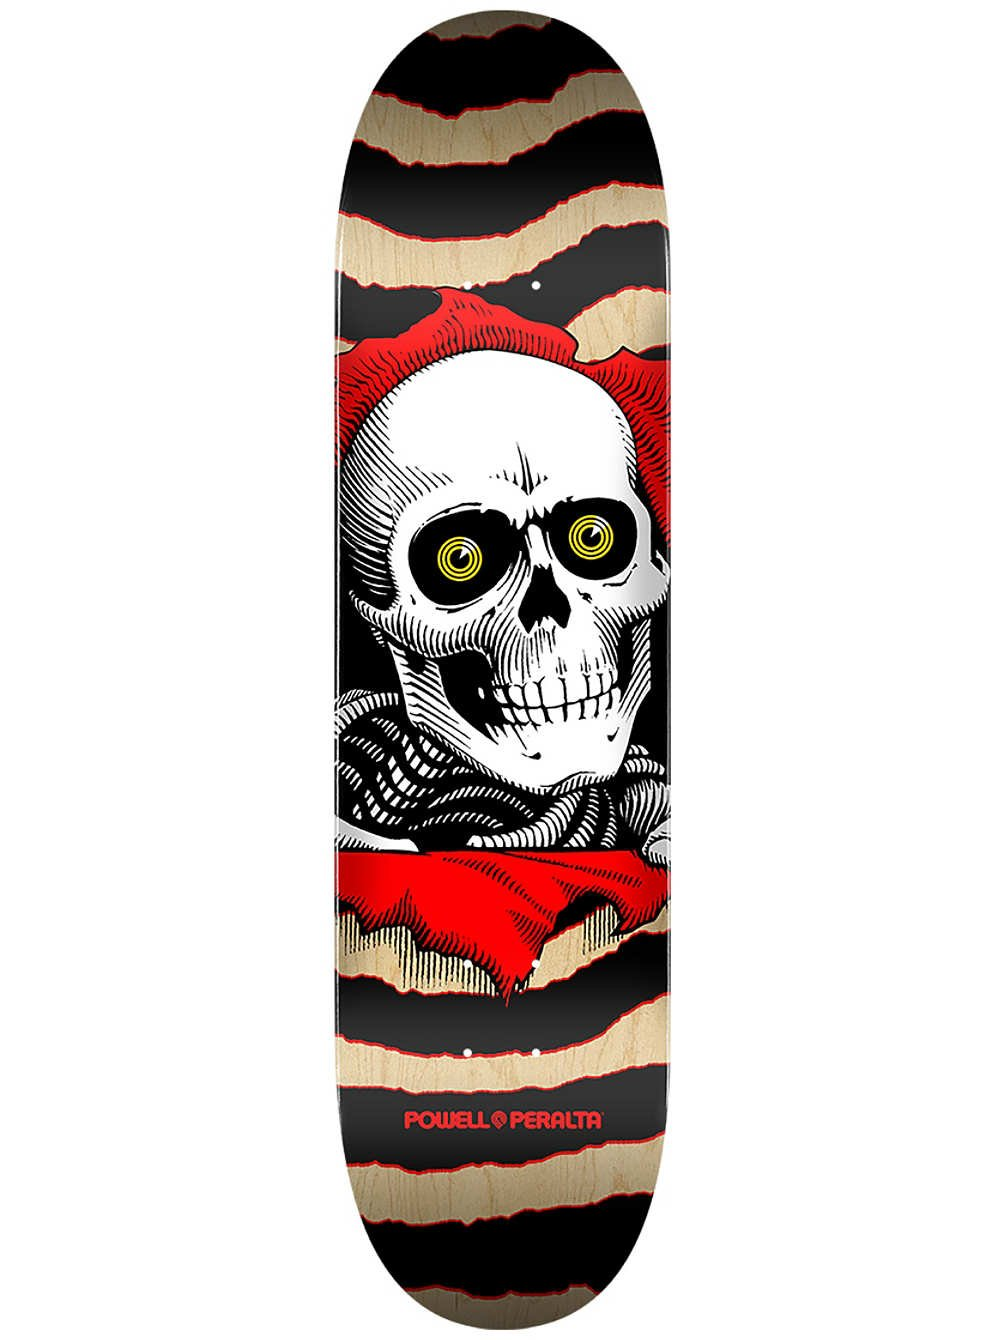 Powell Peralta Ripper One Off 8.0 x 32.125 Skateboard